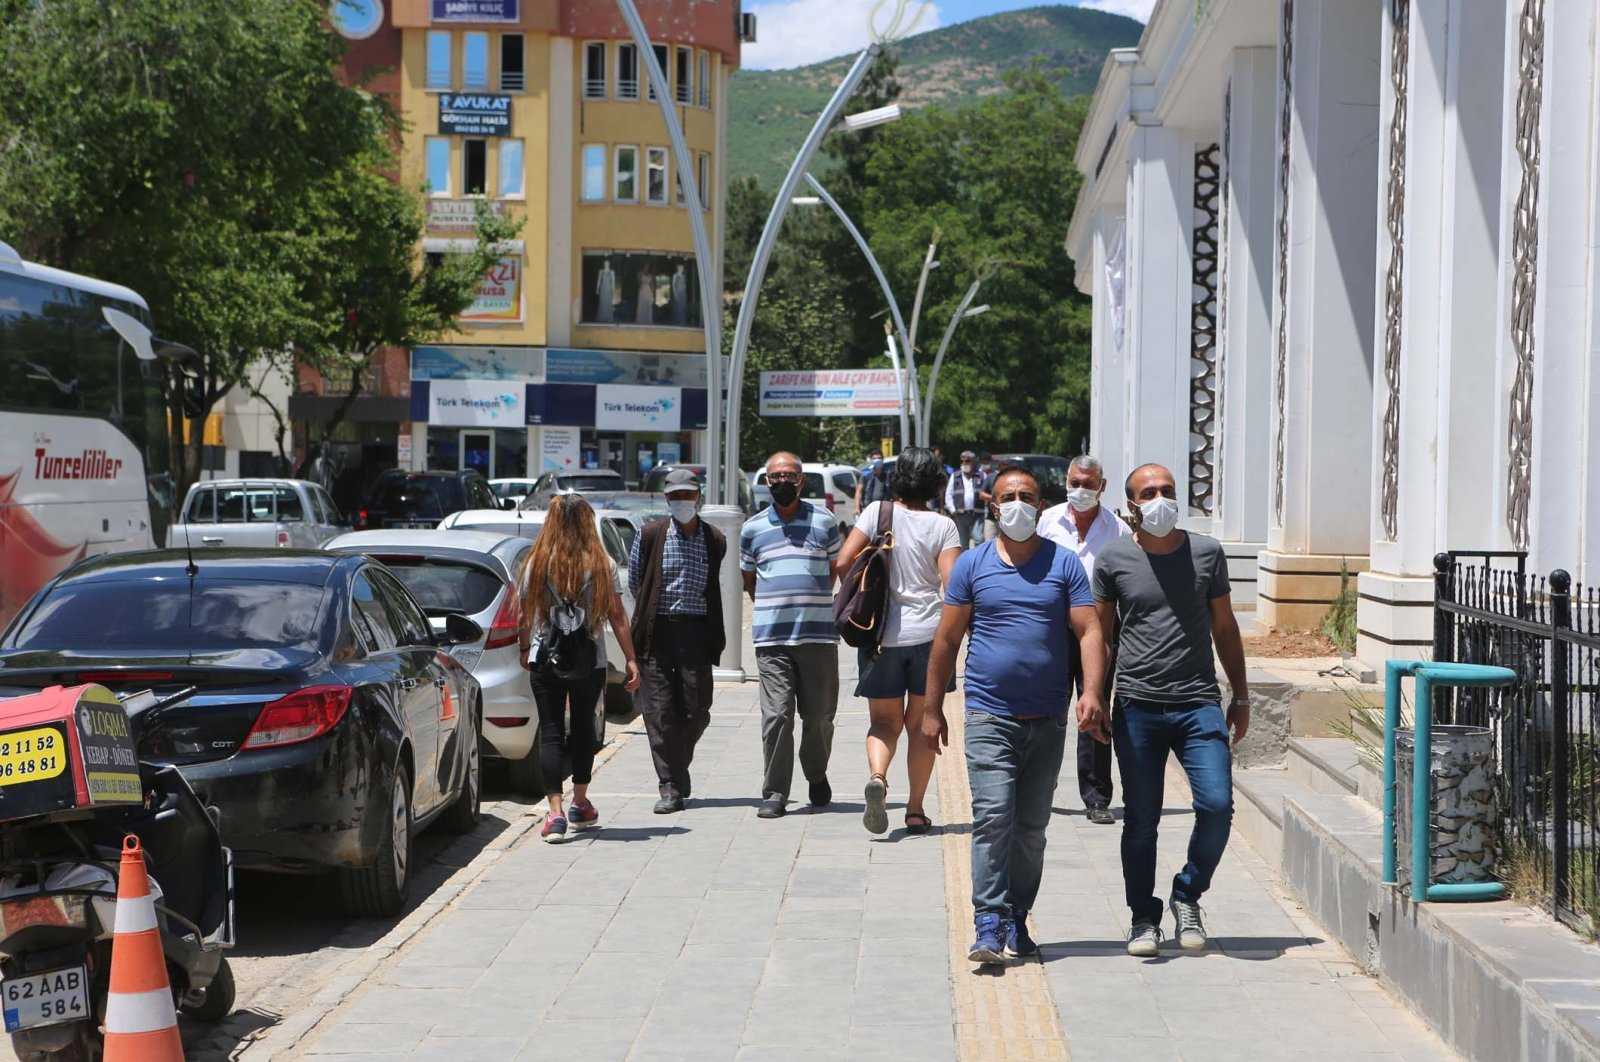 People wearing protective masks walk on a street in Tunceli, eastern Turkey, June 2, 2021. (DHA PHOTO)